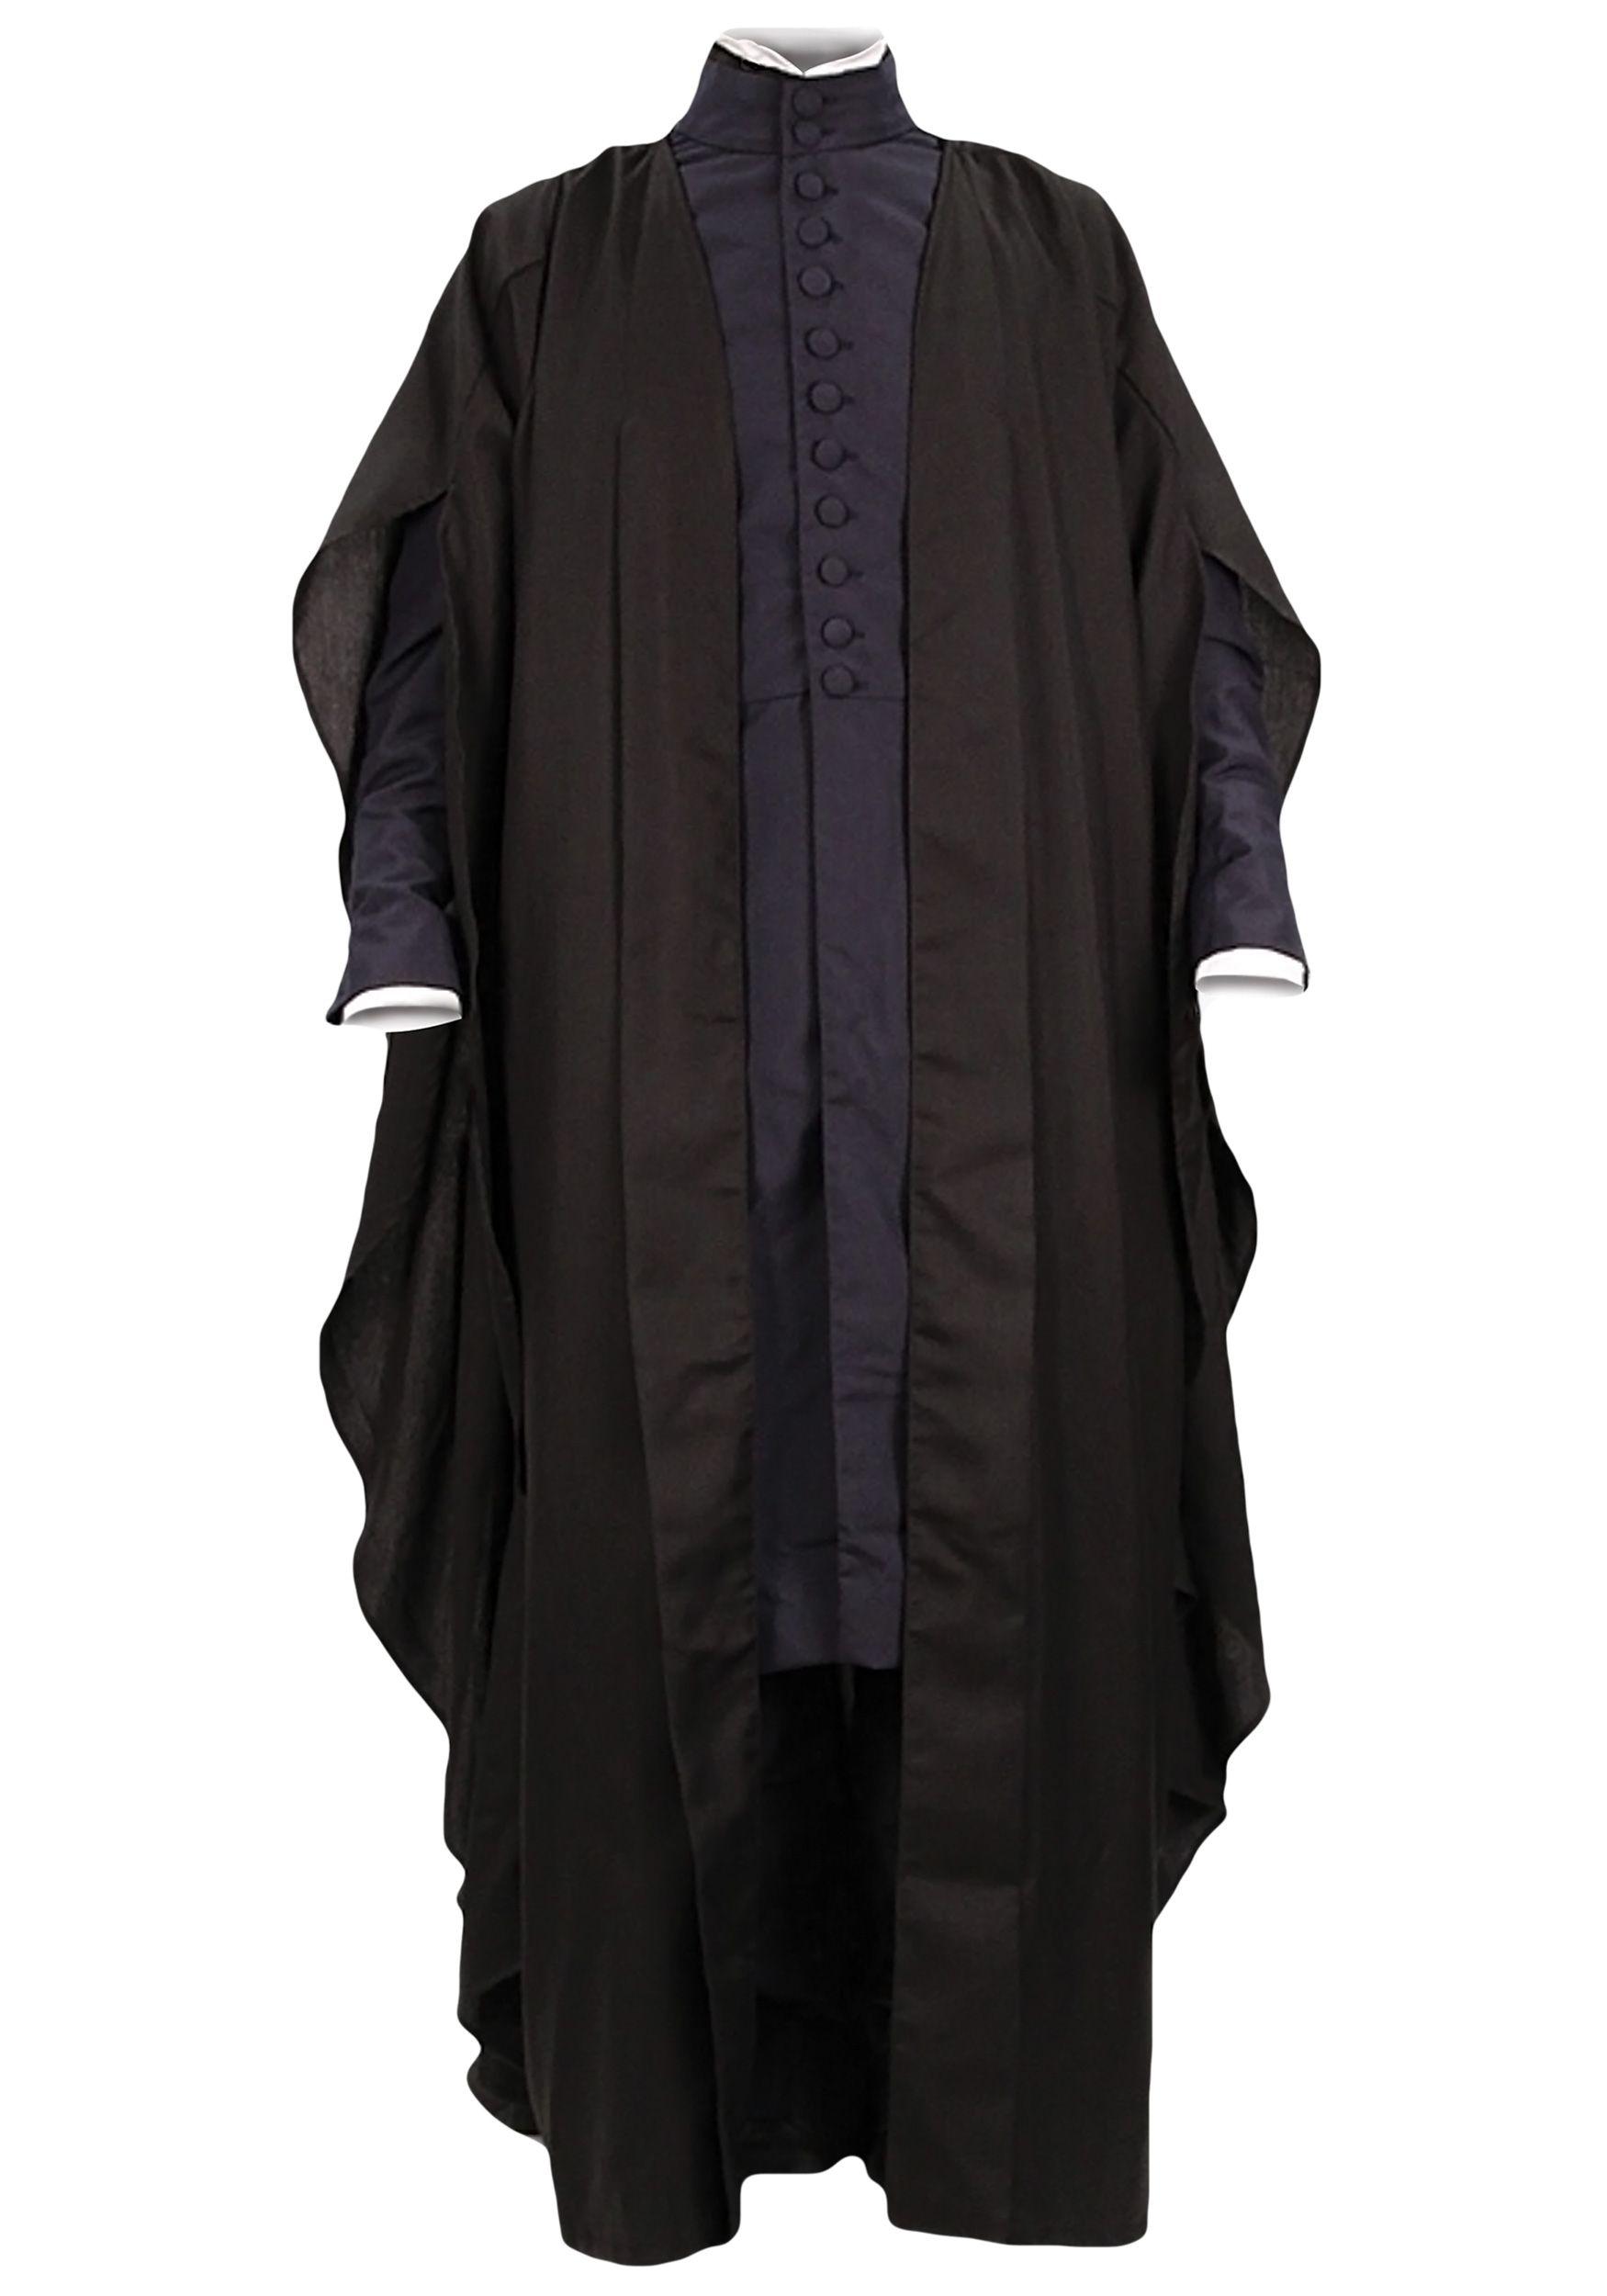 Replica Professor Snape Robe | Harry Potter Win | Pinterest | Kostüm